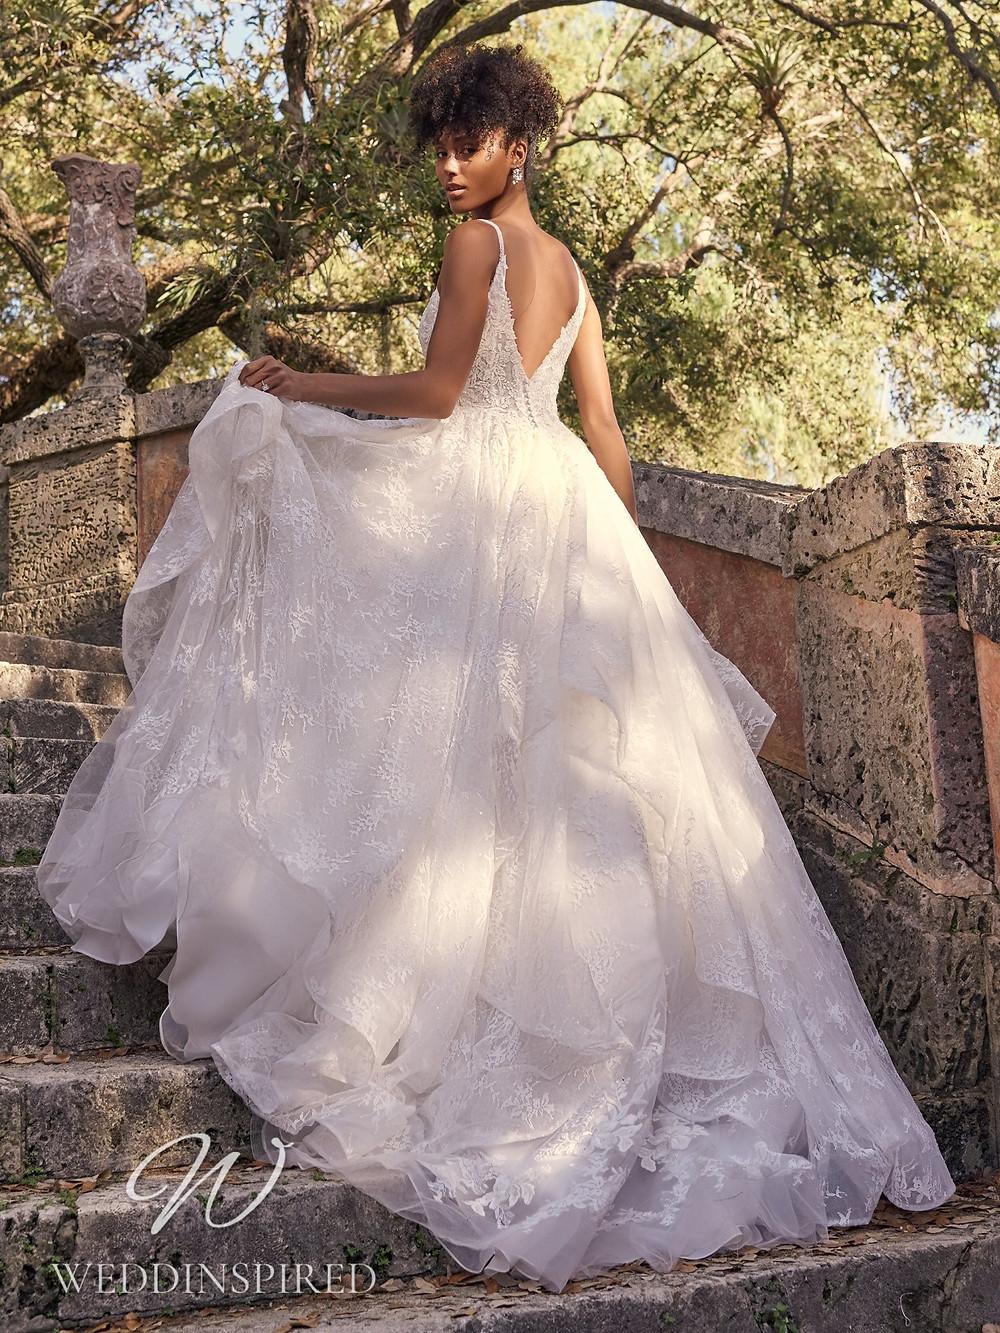 A Maggie Sottero 2021 romantic lace A-line wedding dress